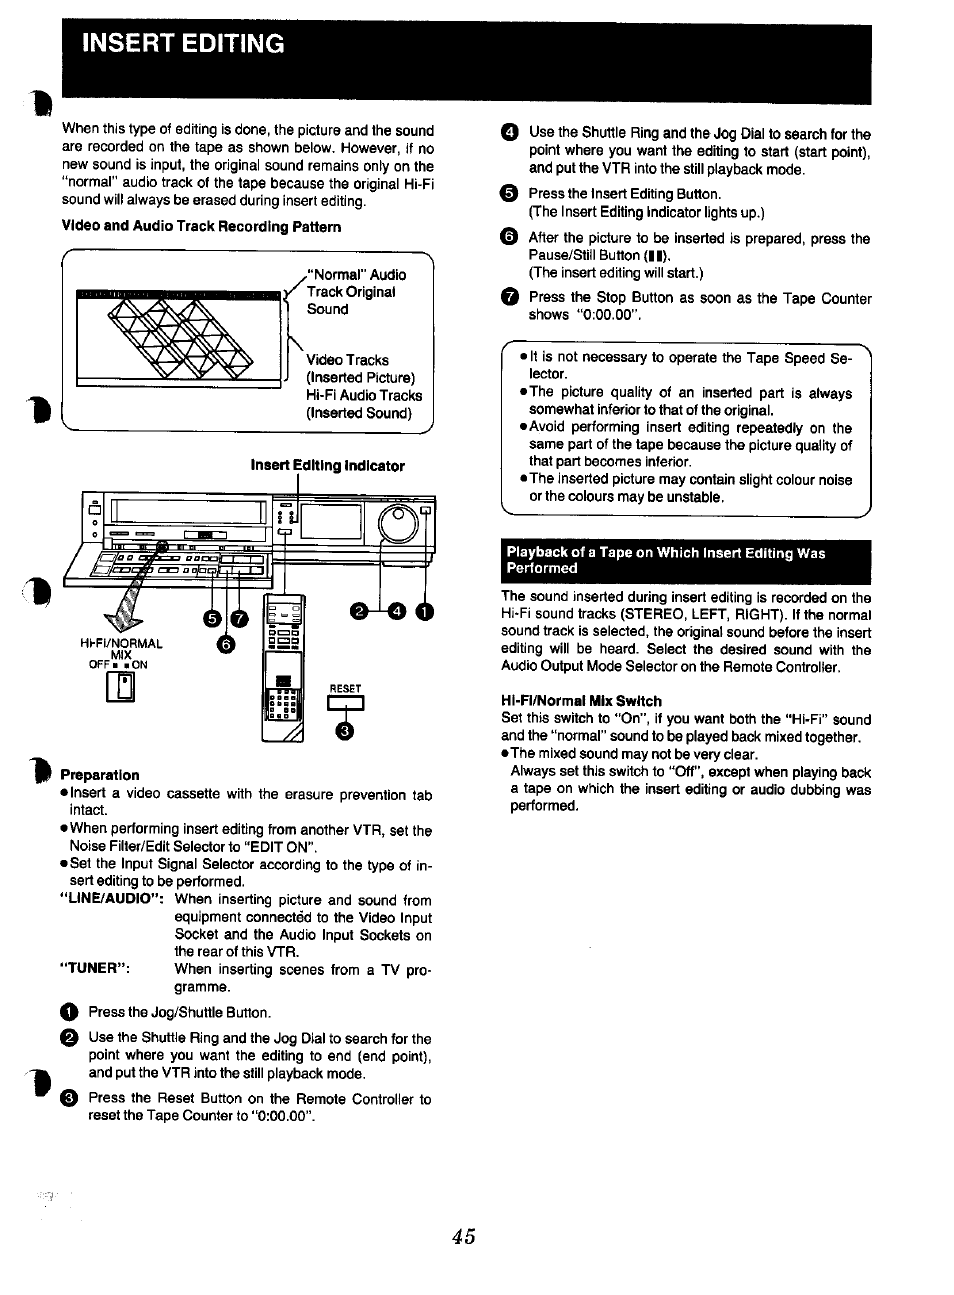 insert editing preparation hi fi normal mix switch panasonic nv rh manualsdir com Operating Manuals Panasonic Phones Panasonic Owner's Manual